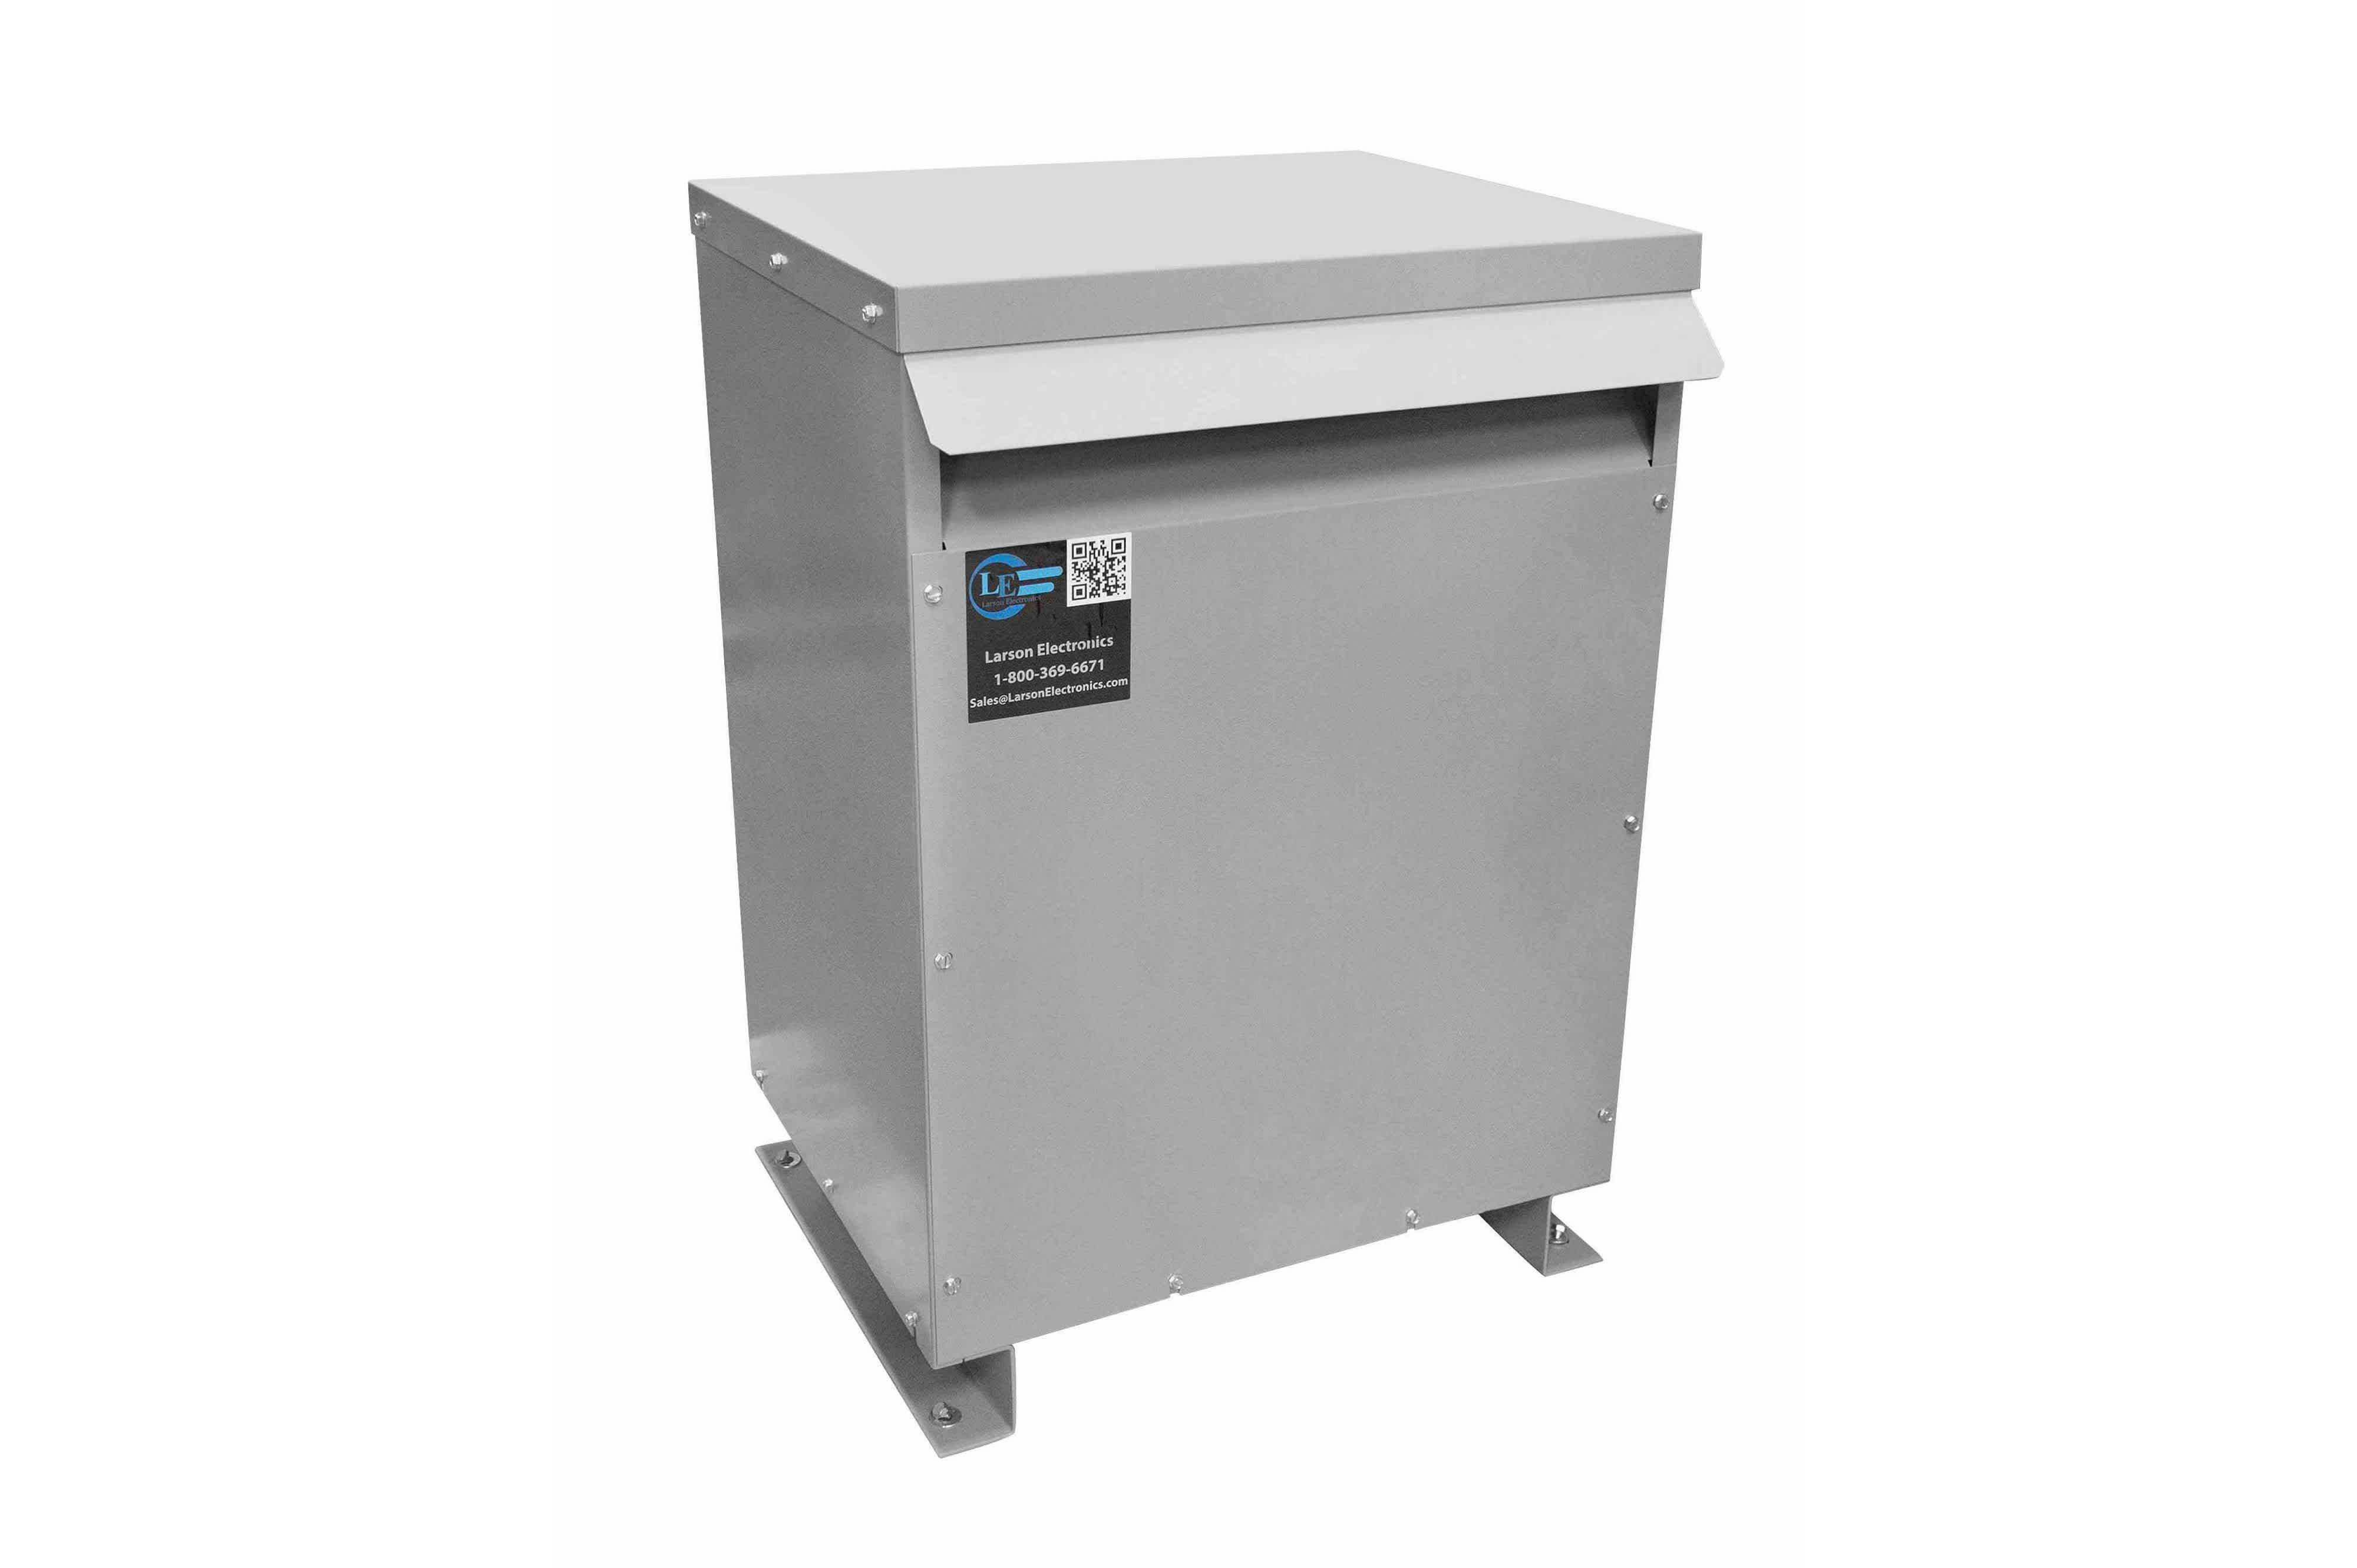 112.5 kVA 3PH Isolation Transformer, 208V Wye Primary, 600V Delta Secondary, N3R, Ventilated, 60 Hz